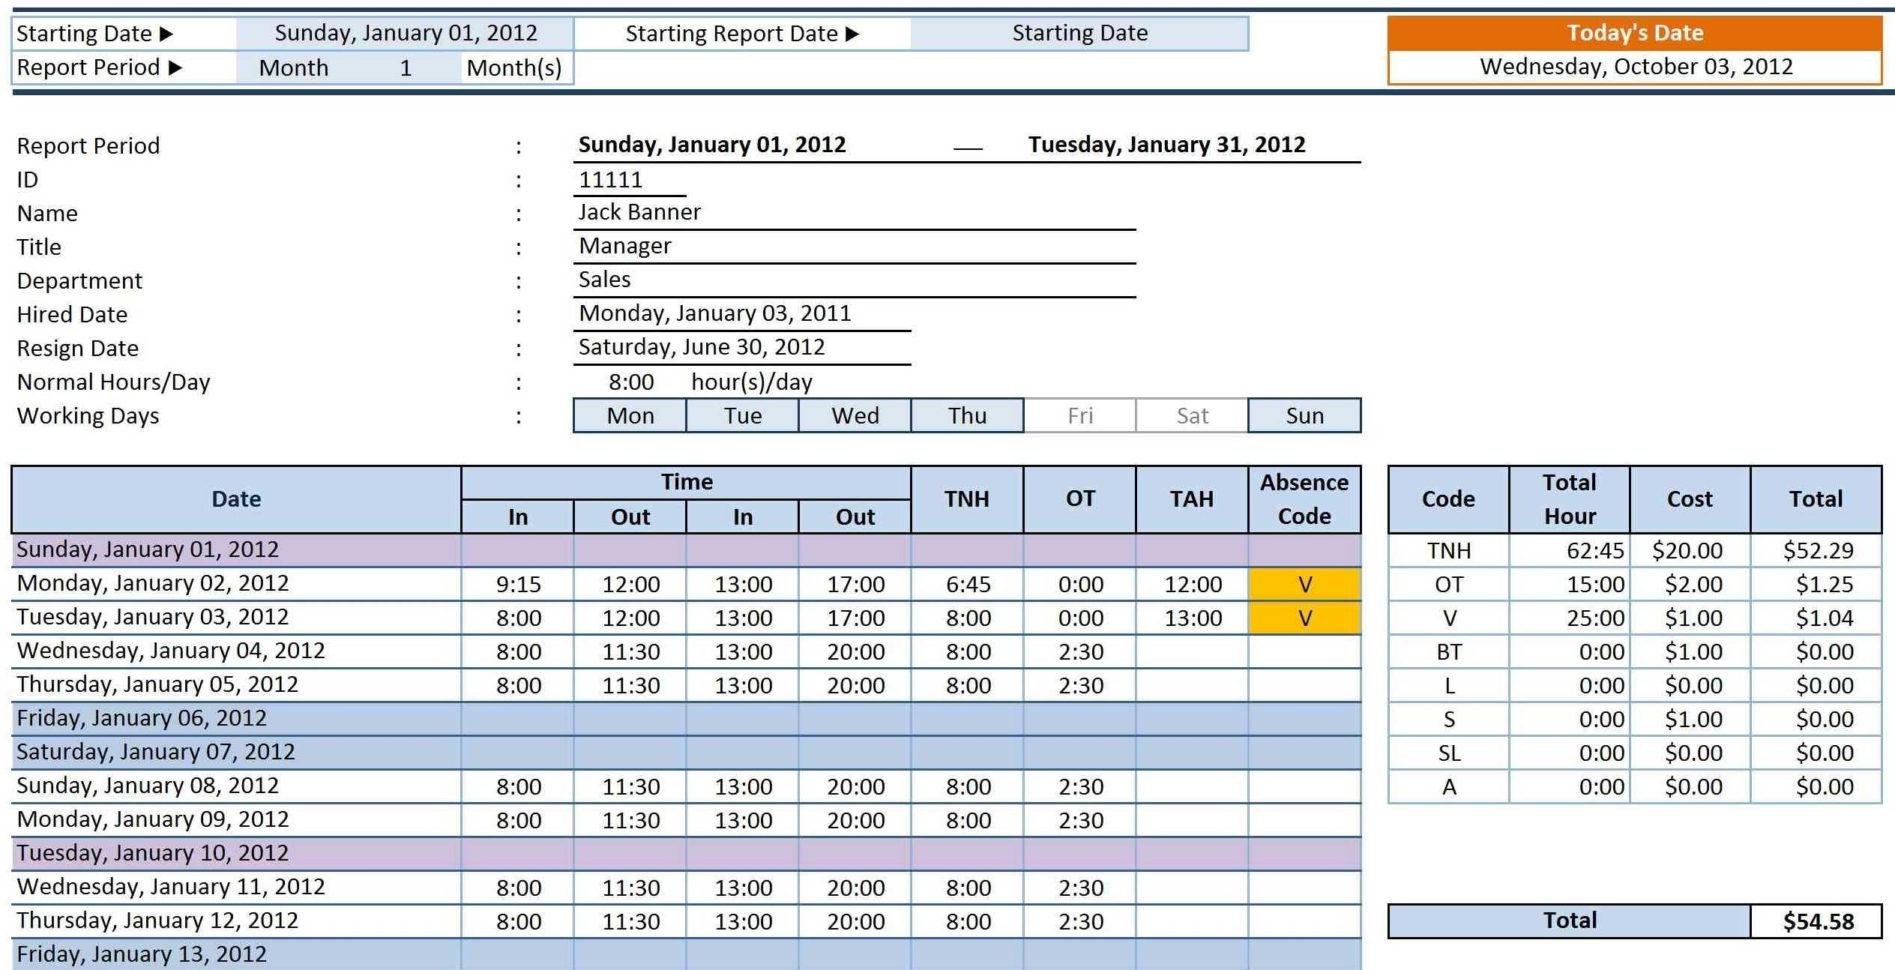 Schedule Spreadsheet For Employee Schedule Spreadsheet